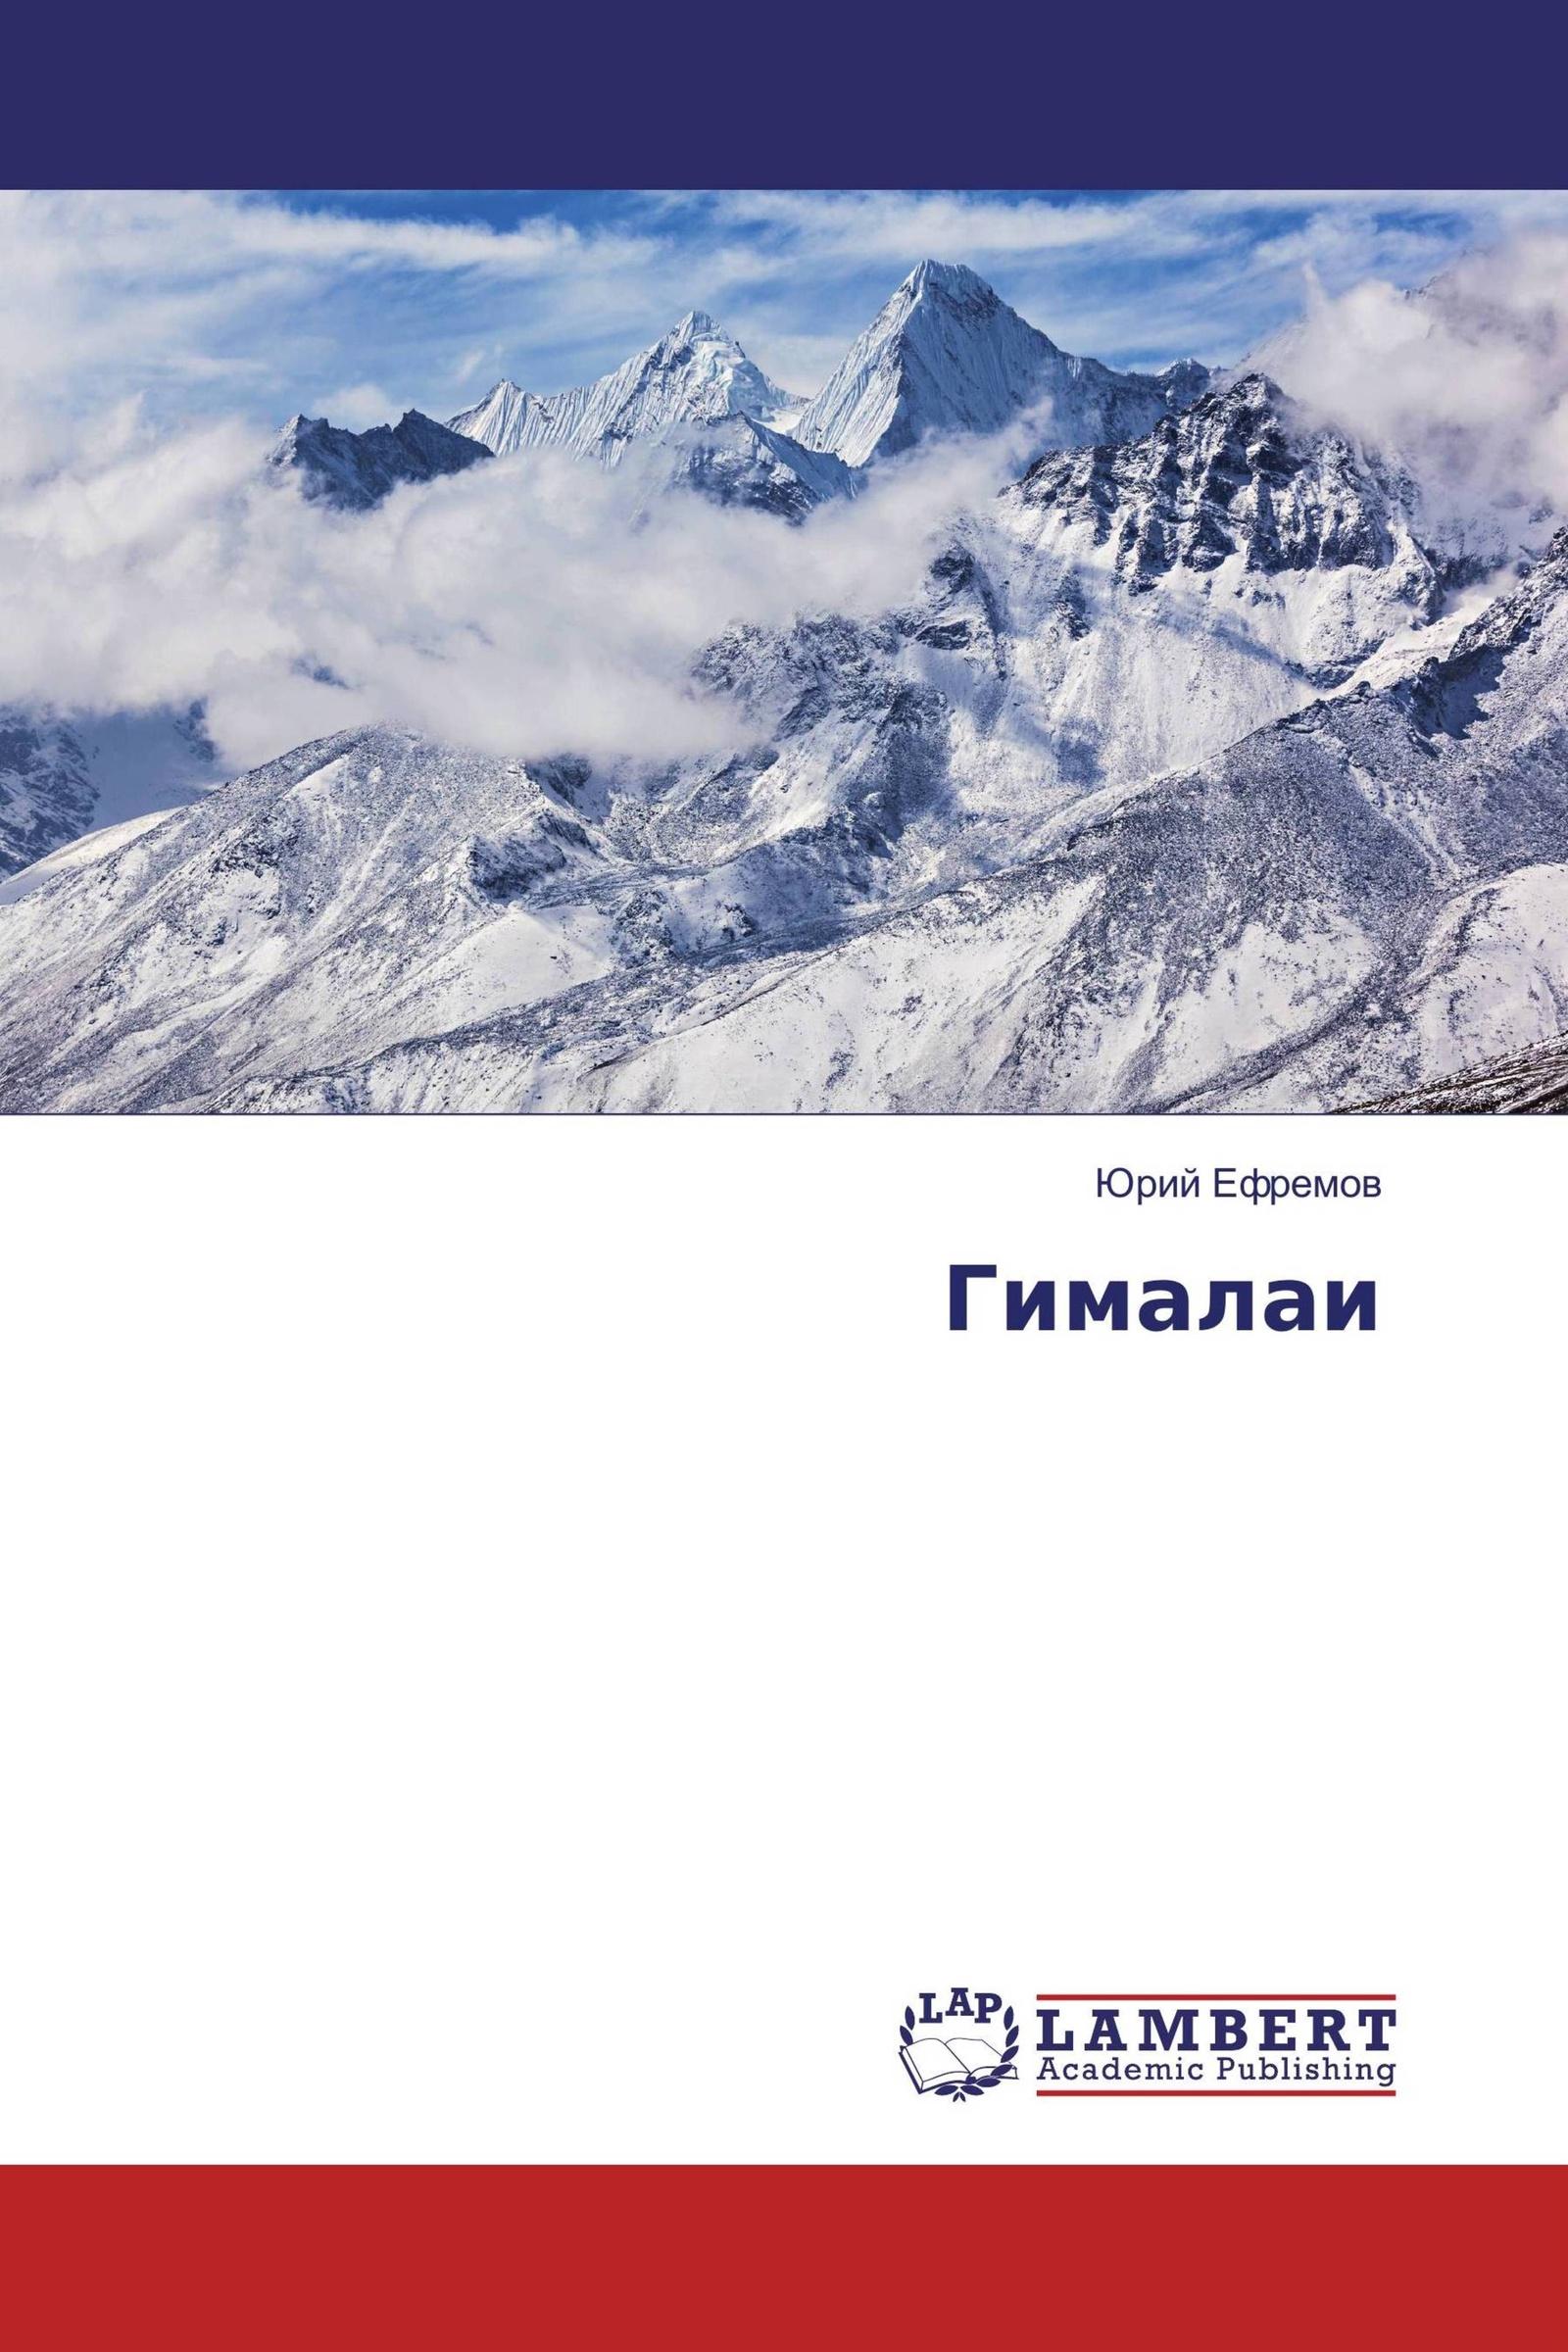 Гималаи | vv-travel.ru